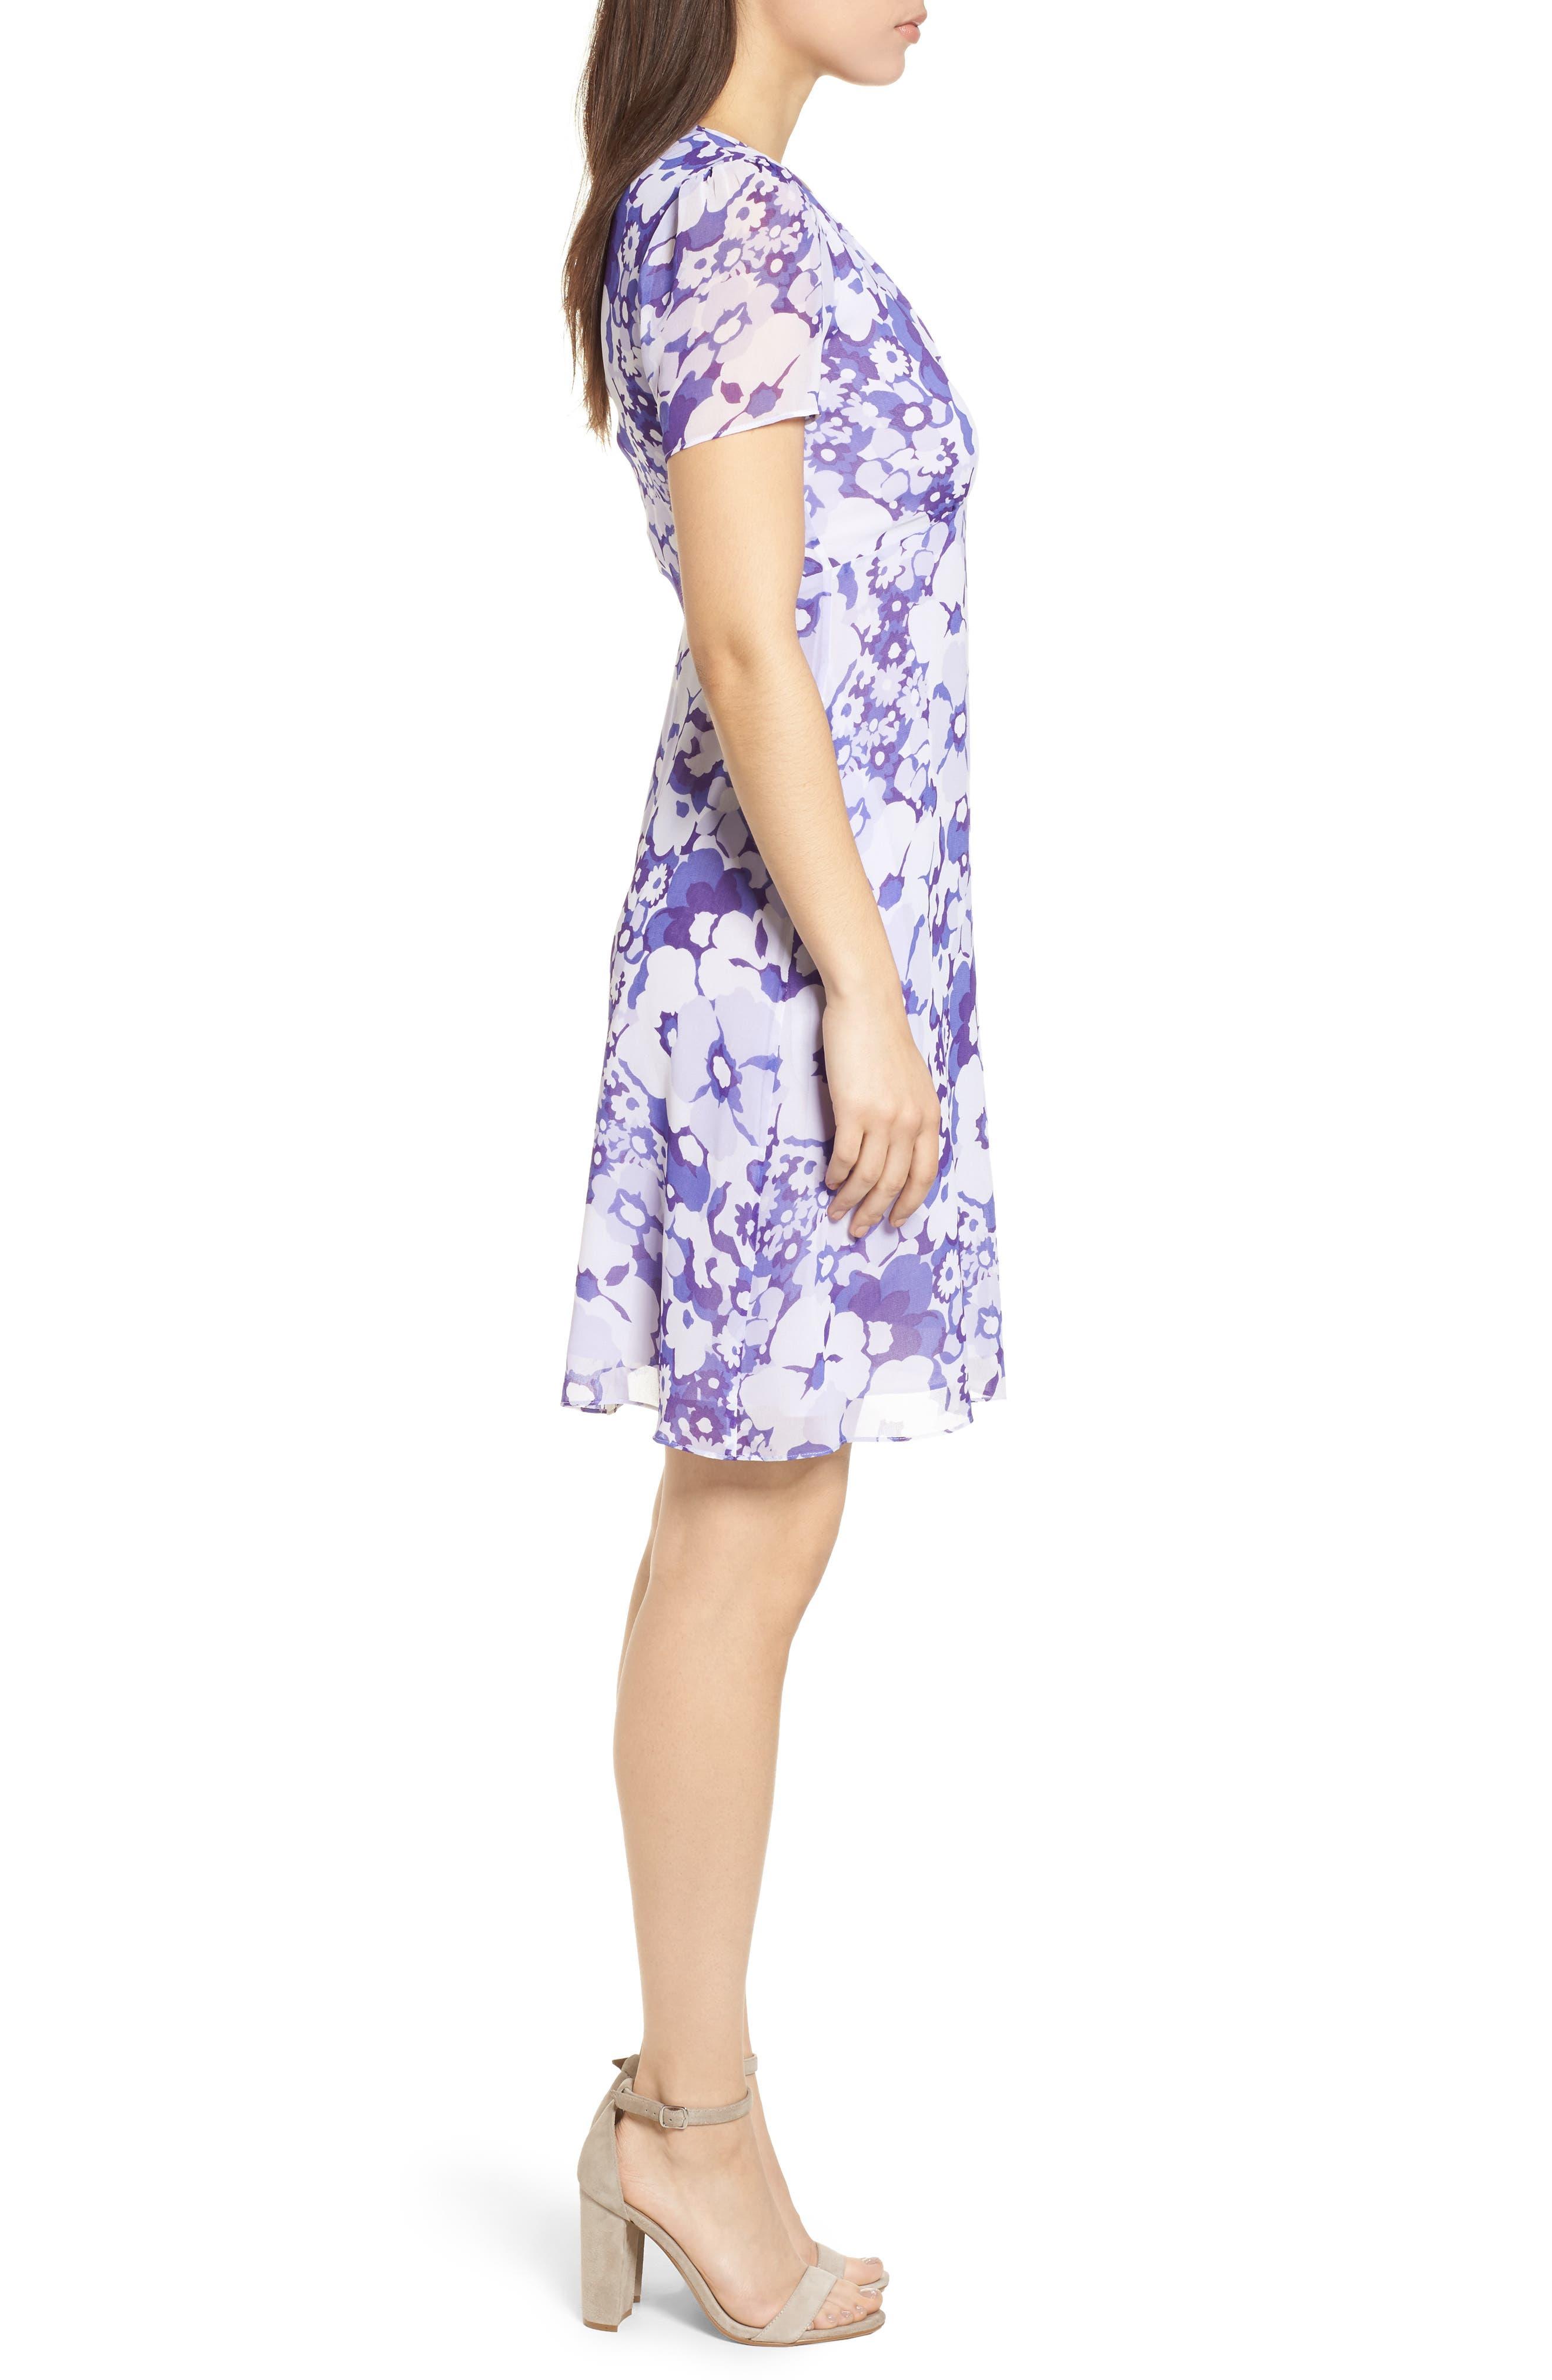 Springtime Floral Dress,                             Alternate thumbnail 3, color,                             580